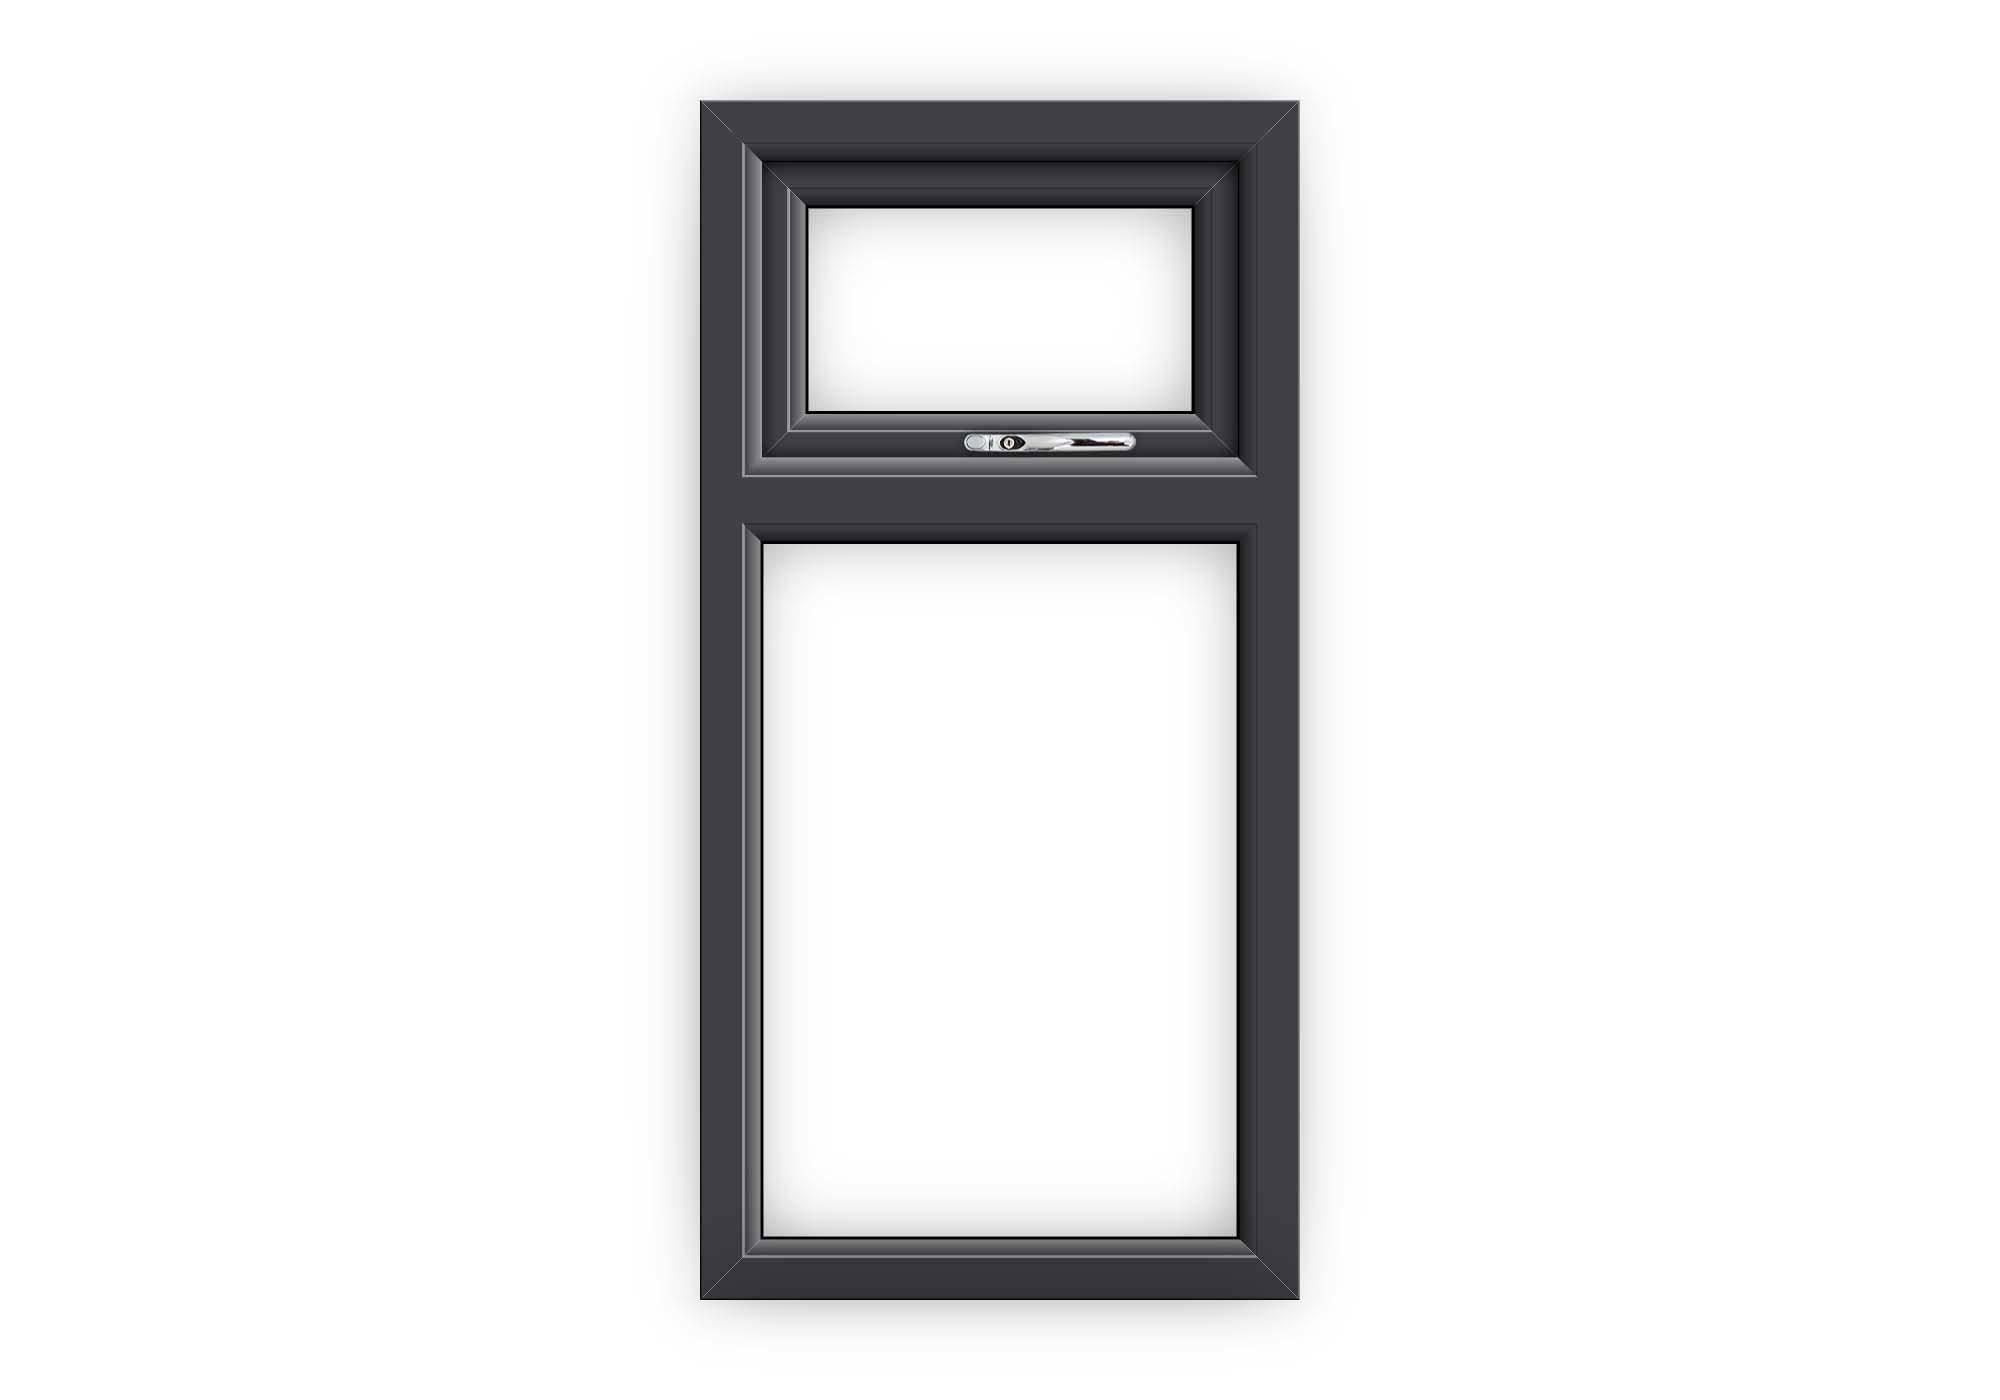 Style 6 uPVC Windows